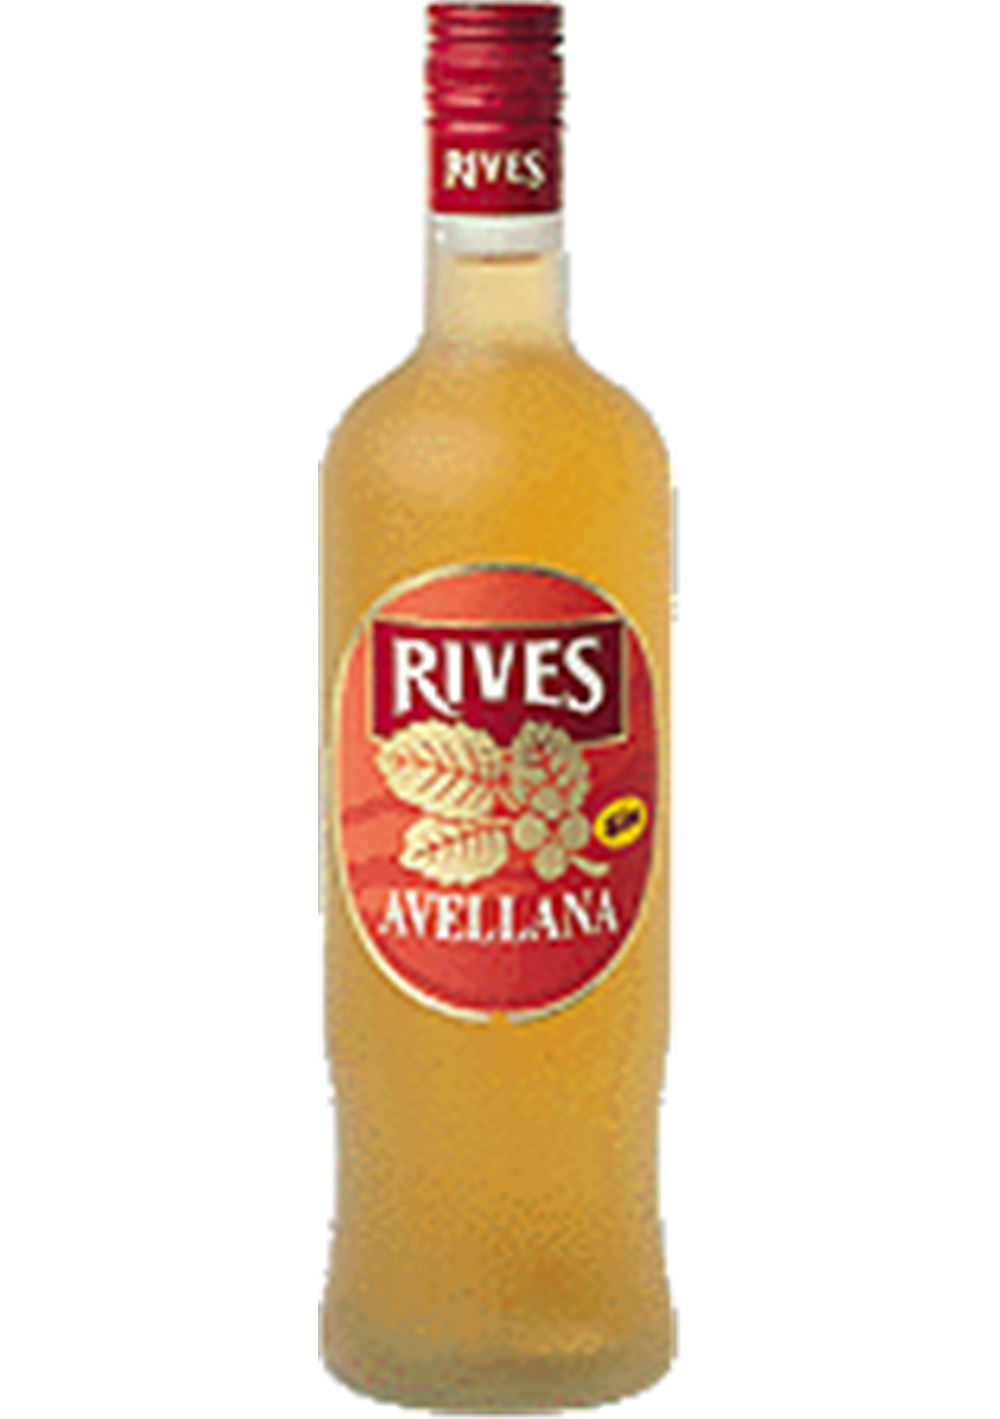 RIVES AVELLANA SALCOHOL